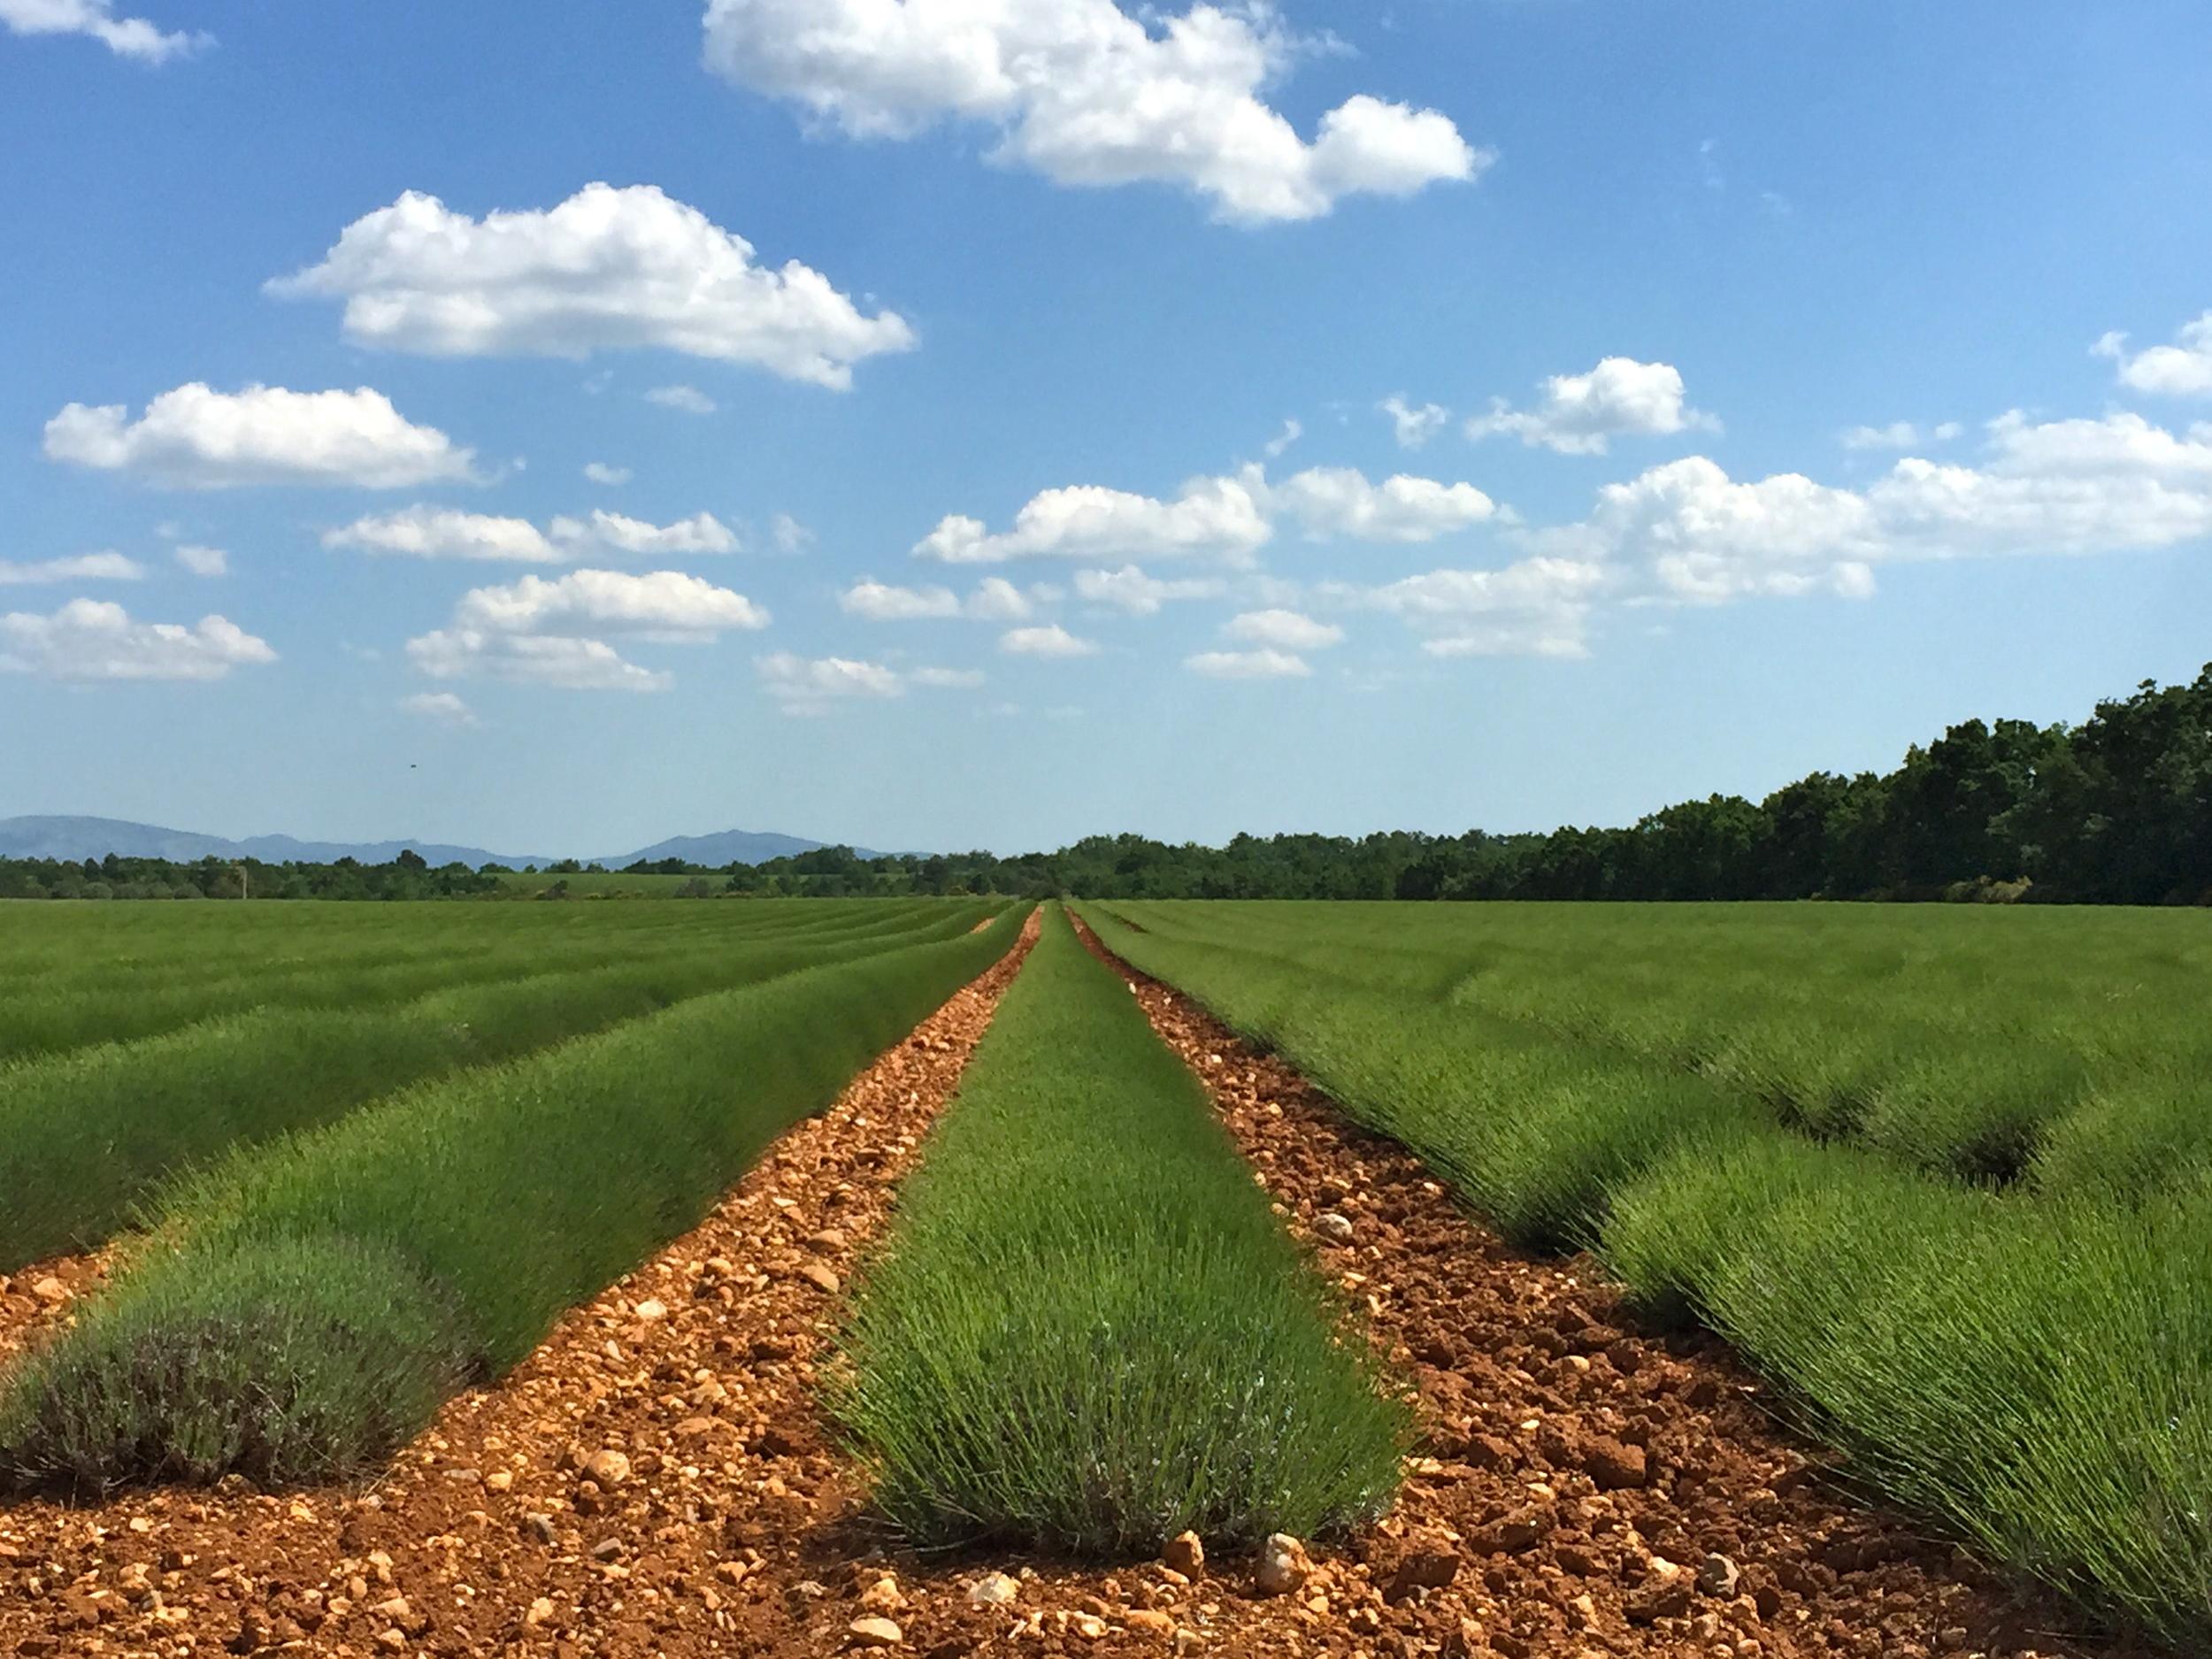 The lavender fields of the Plateau de Valensole.